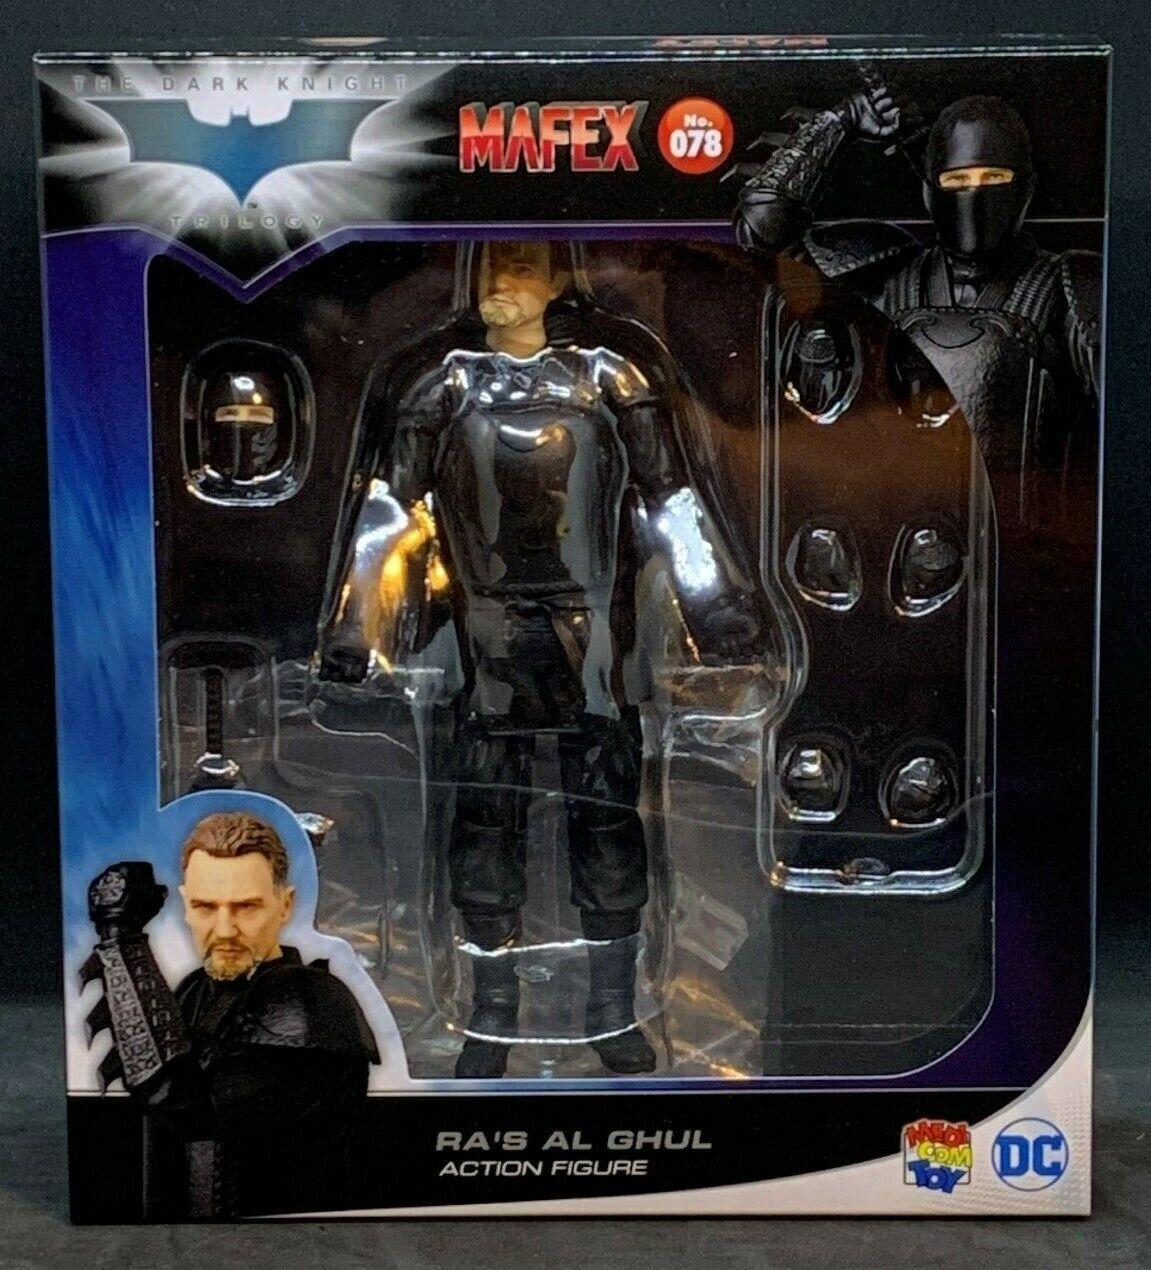 Medicom MAFEX Ra's Al Ghul - The Dark Knight Trilogy No. 078